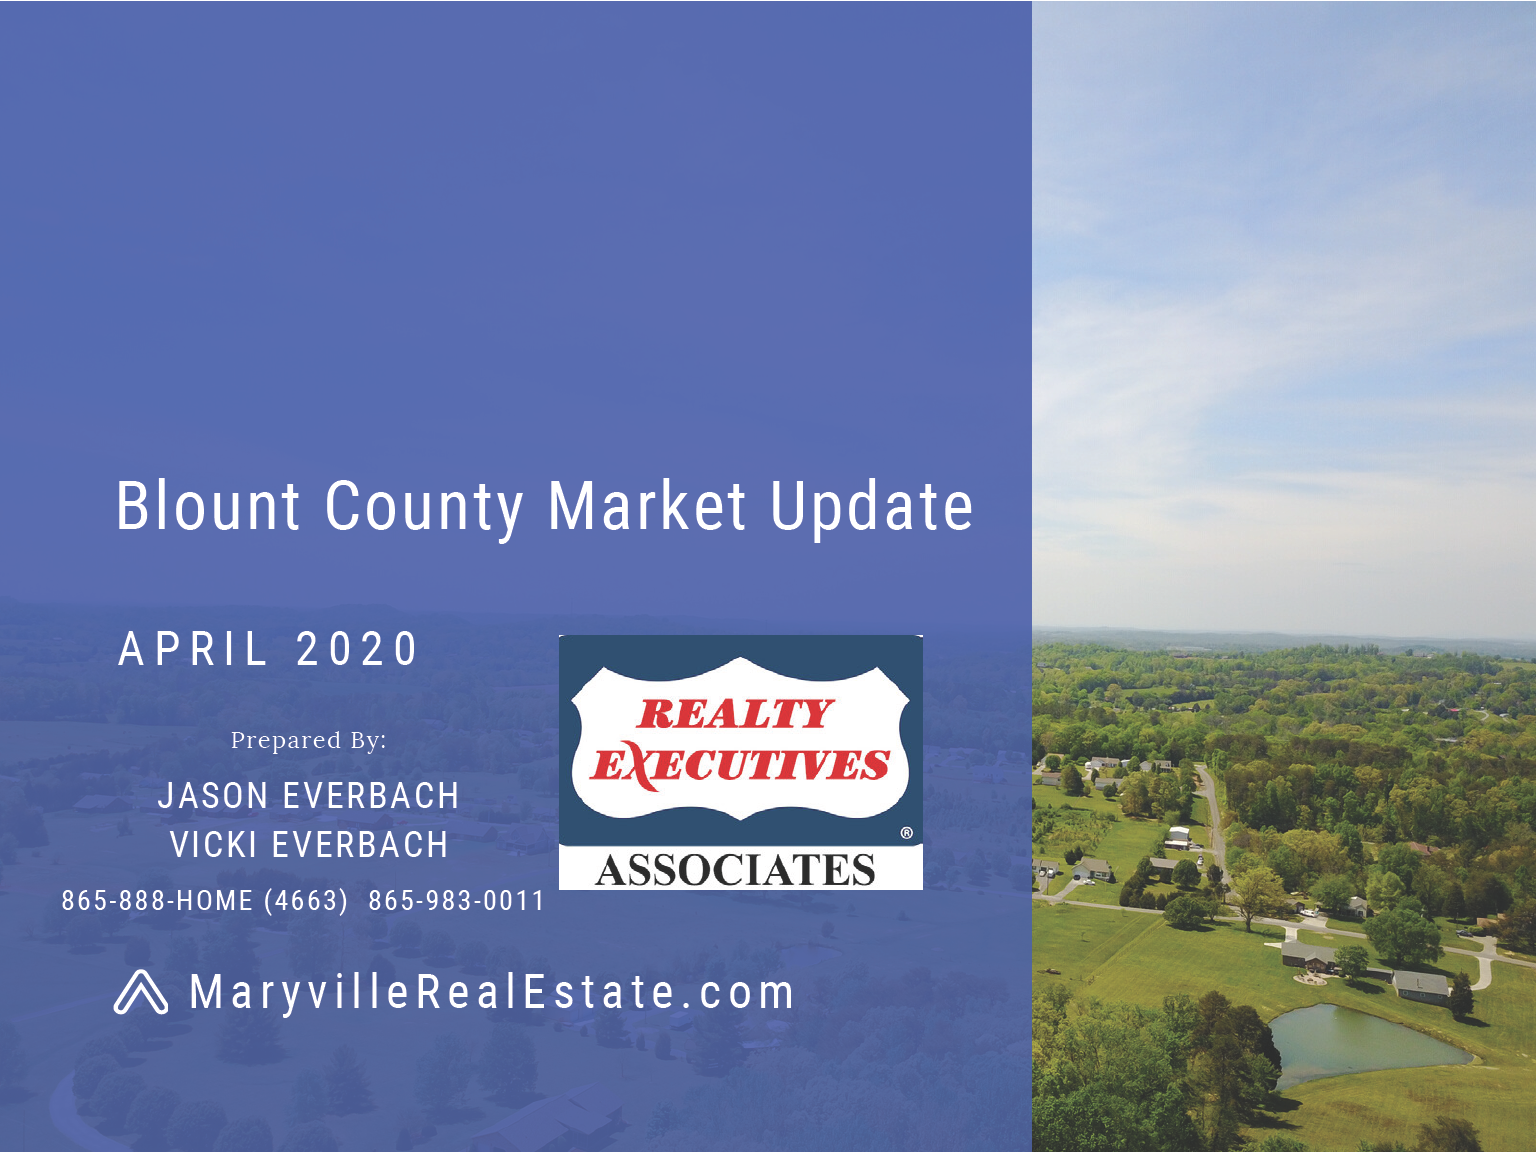 April 2020 Blount County Market Update